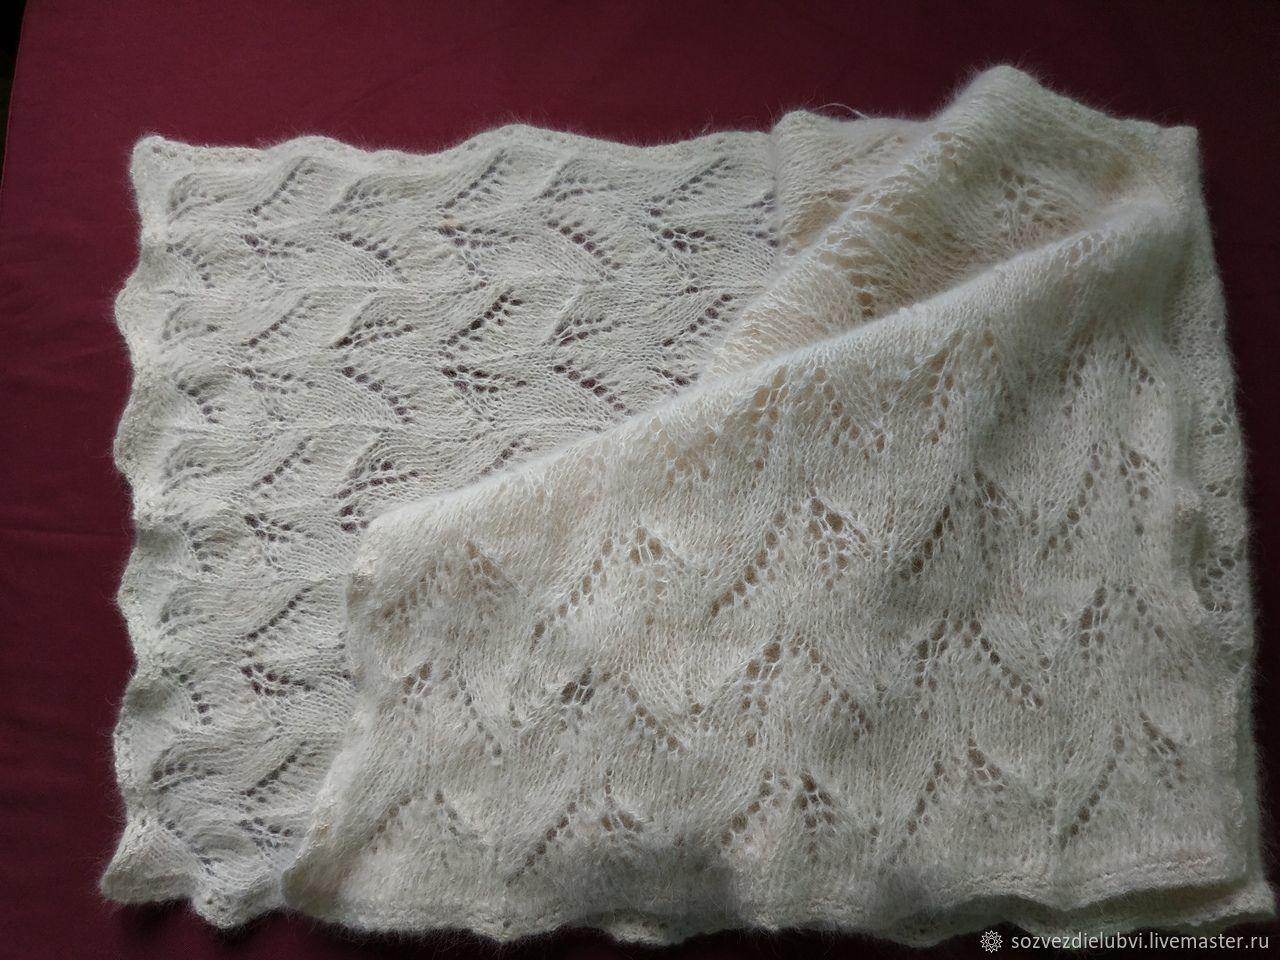 Stole from the dog wool, Wraps, Krasnoyarsk,  Фото №1